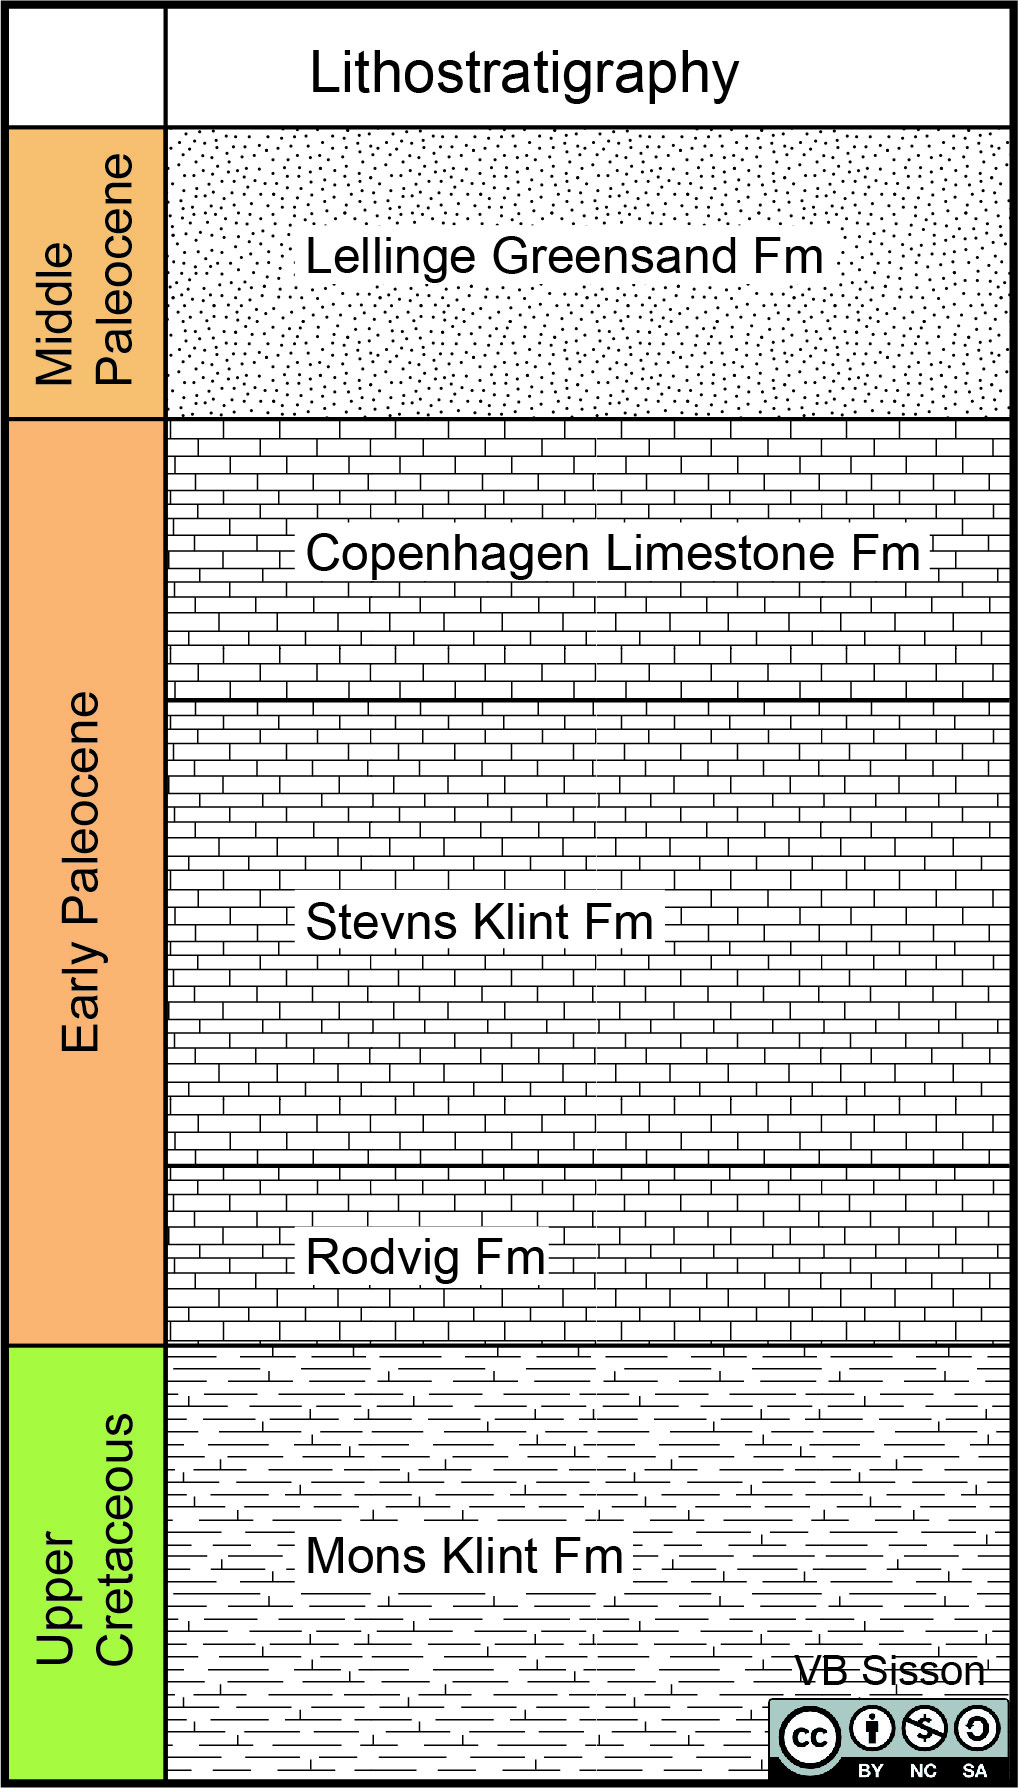 Stratigraphic column for Stevns Klint